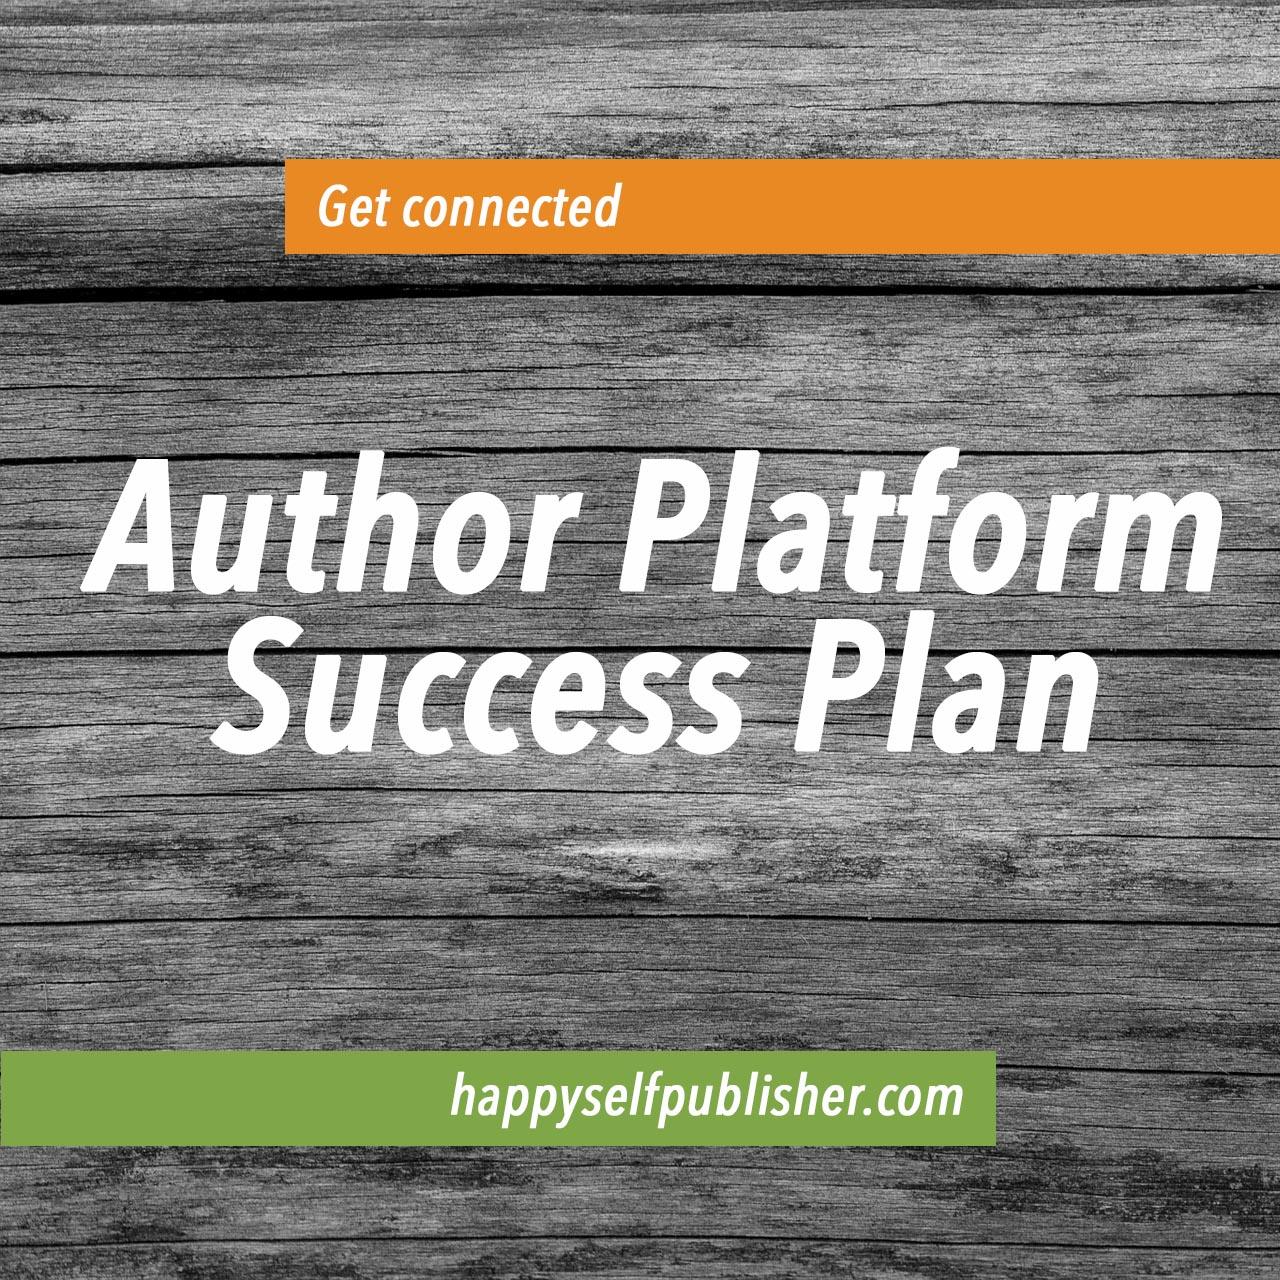 author platform